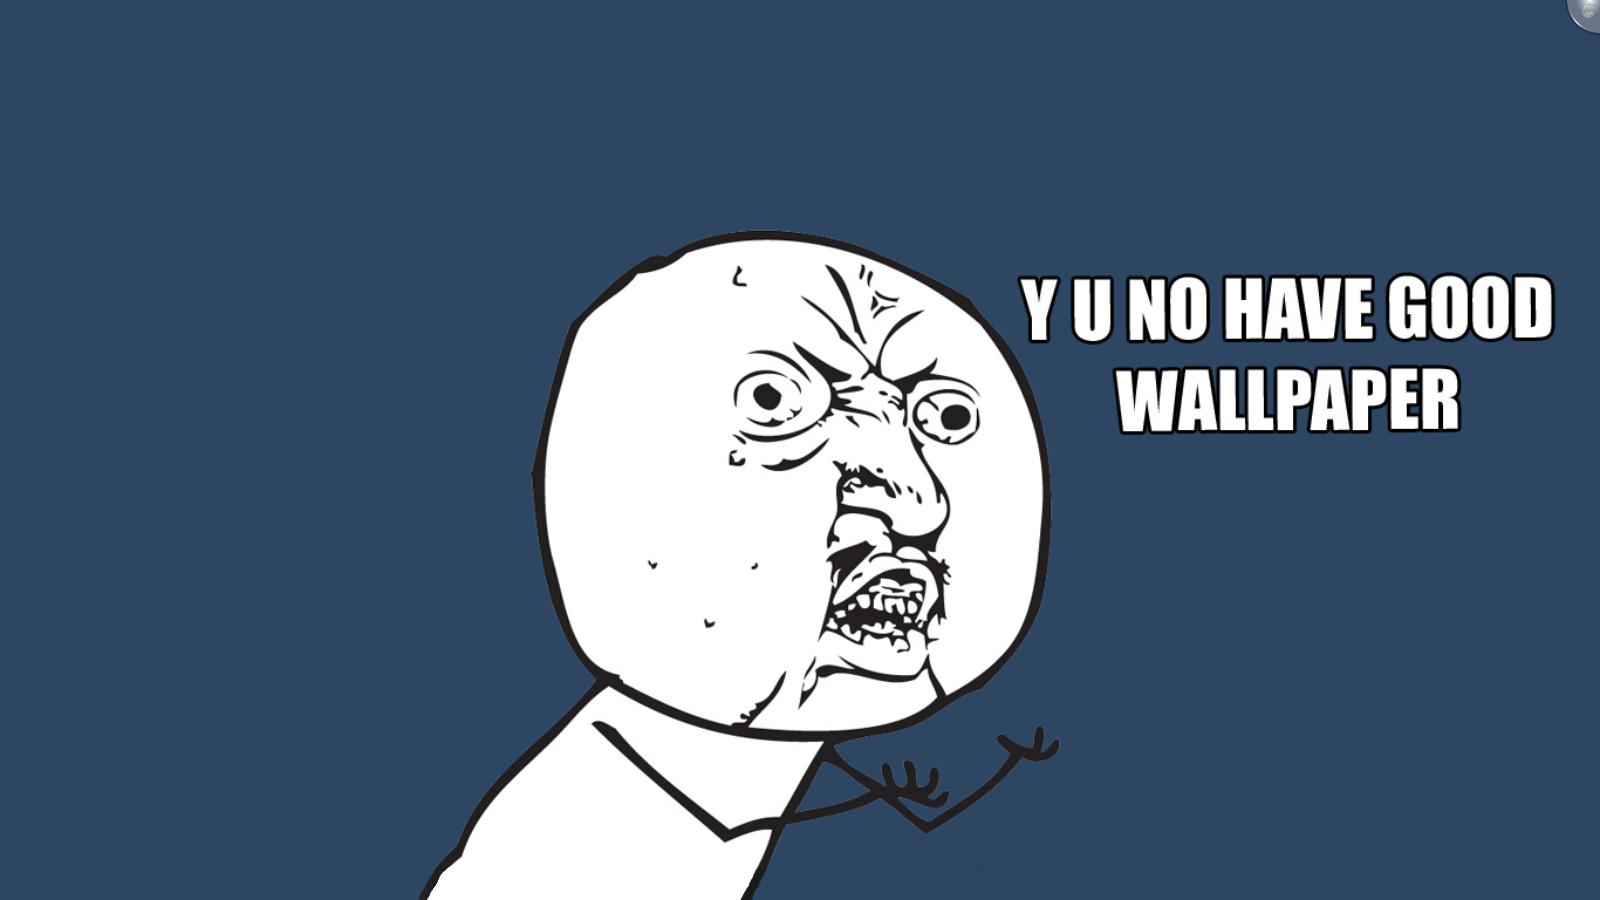 Download Humor Meme Wallpaper 1600x900 Wallpoper 274438 1600x900